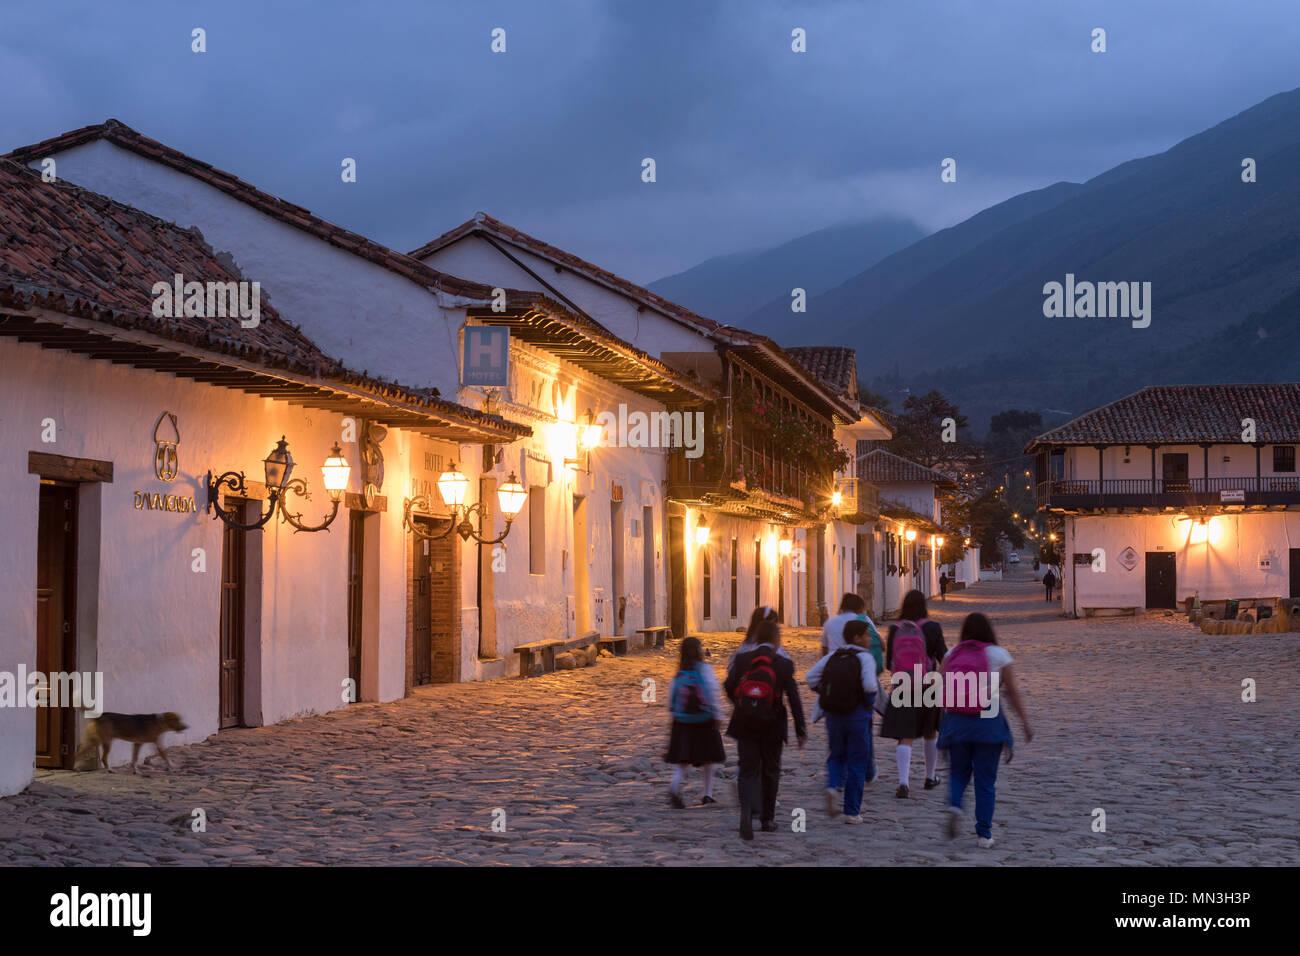 The school run, Plaza Mayor at dawn, Villa de Leyva, Boyacá, Colombia - Stock Image